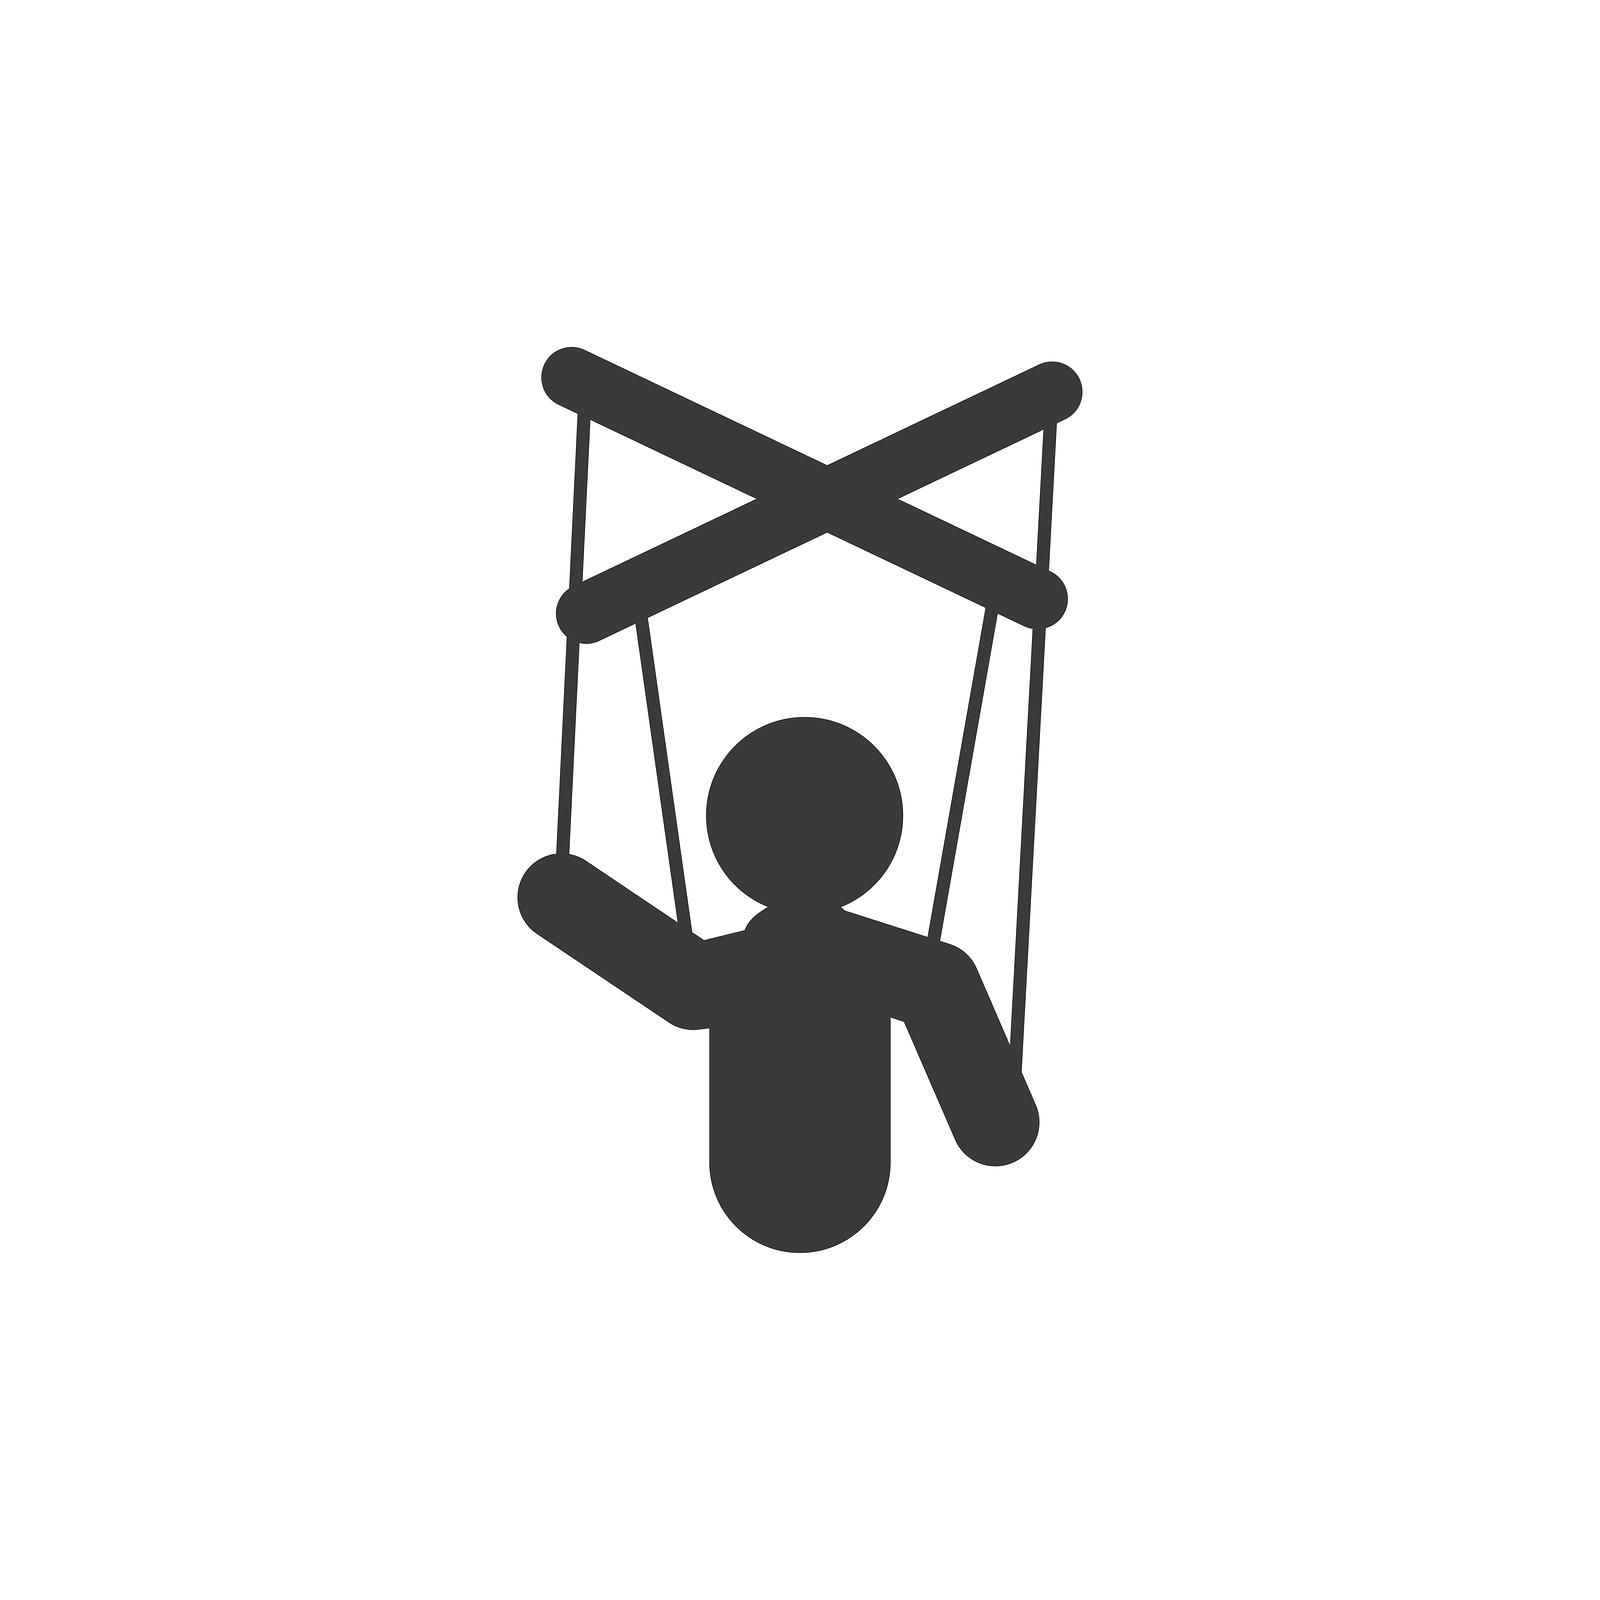 bigstock-Marionette-Puppet-Vector-Icon--266197822.jpg